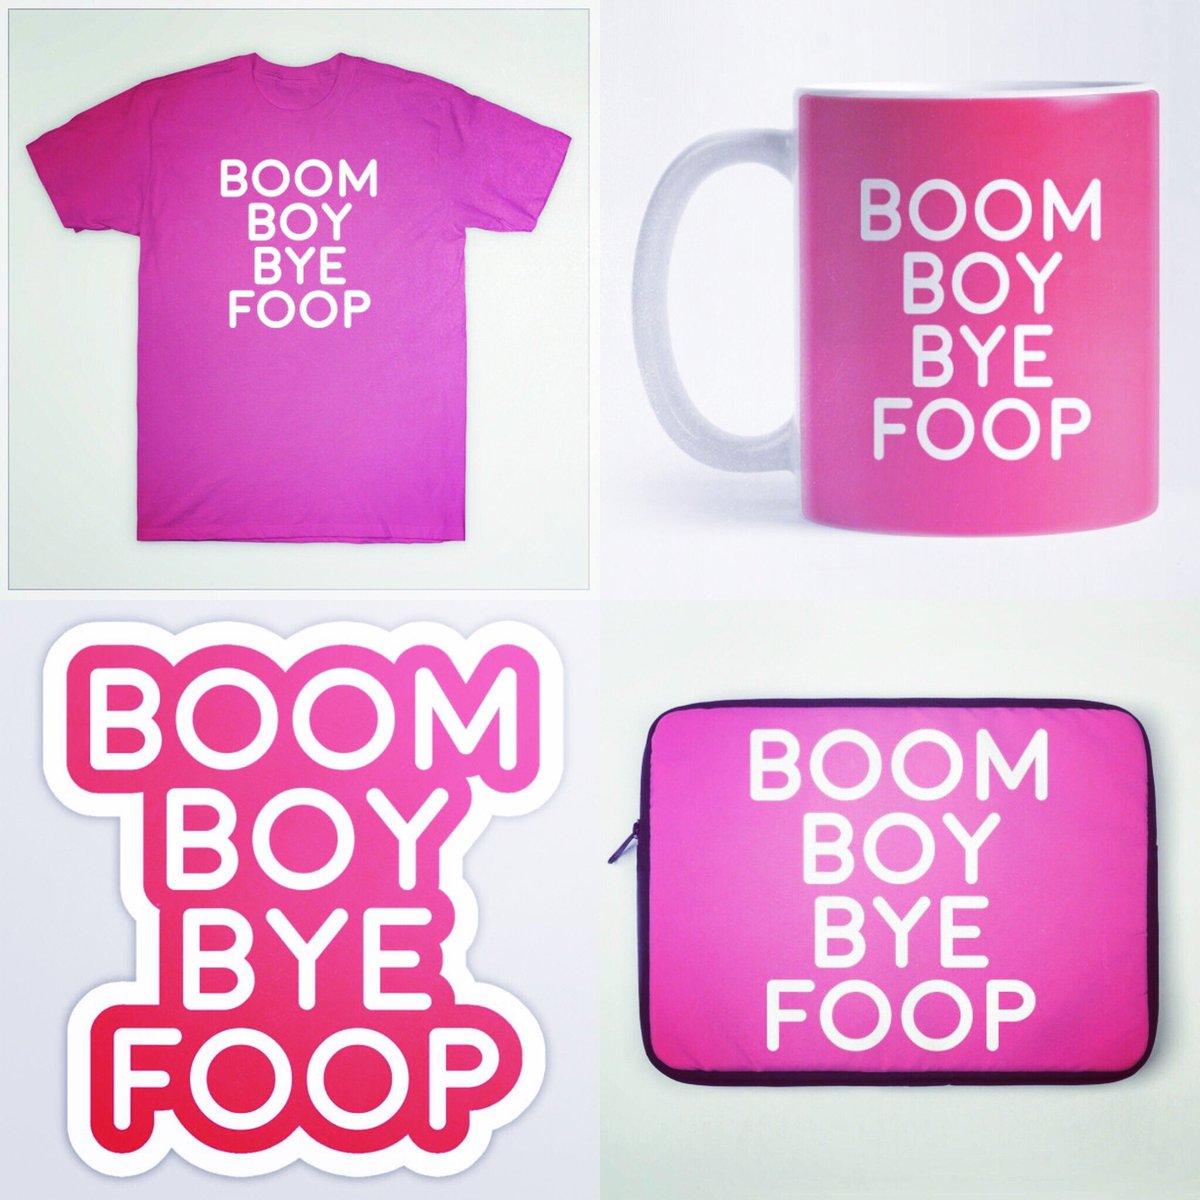 Boy Bye Boom Foop Stuff available at https://t.co/Hee5HoZfUL our @TeePublic page enjoy! #boomboybyefoop https://t.co/kwrg9u2s90